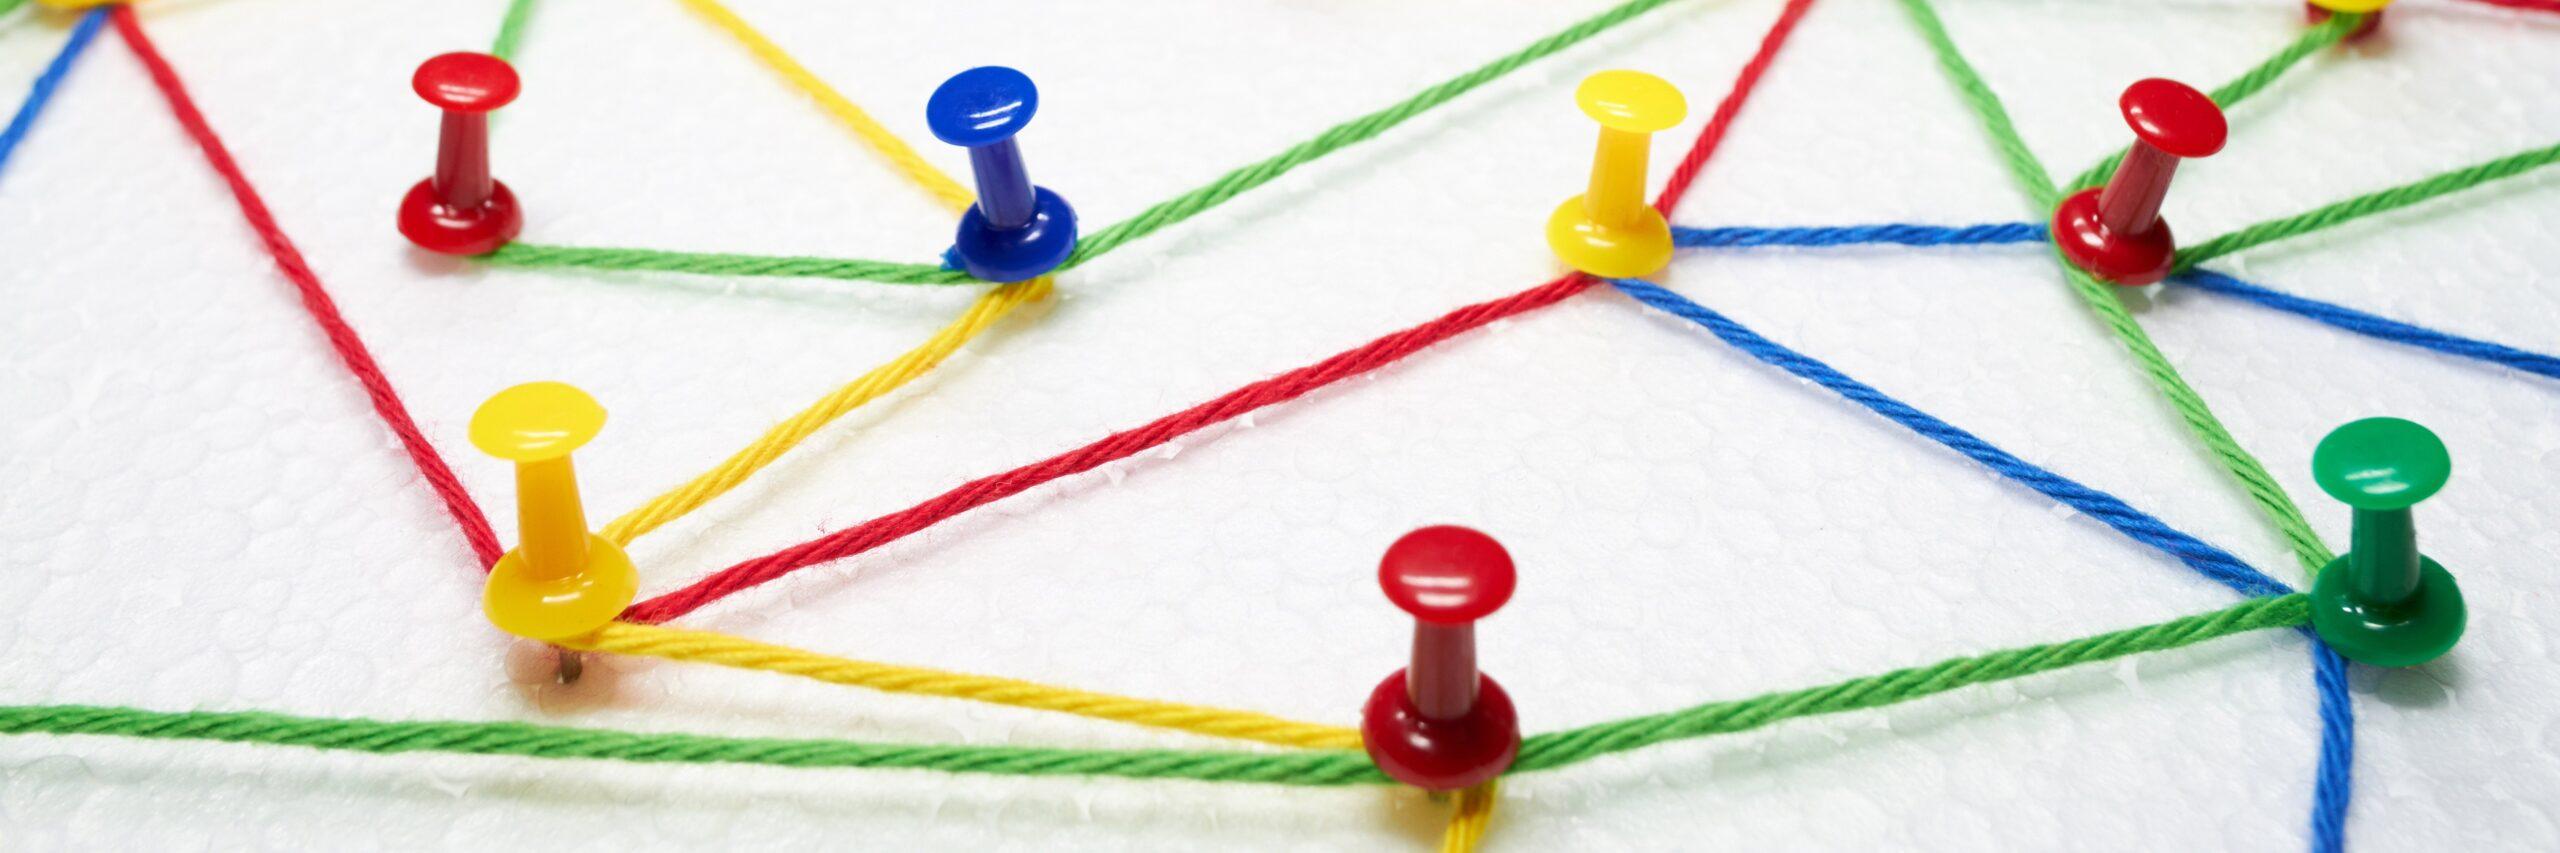 network-design-drawing-pins-adobe.jpg